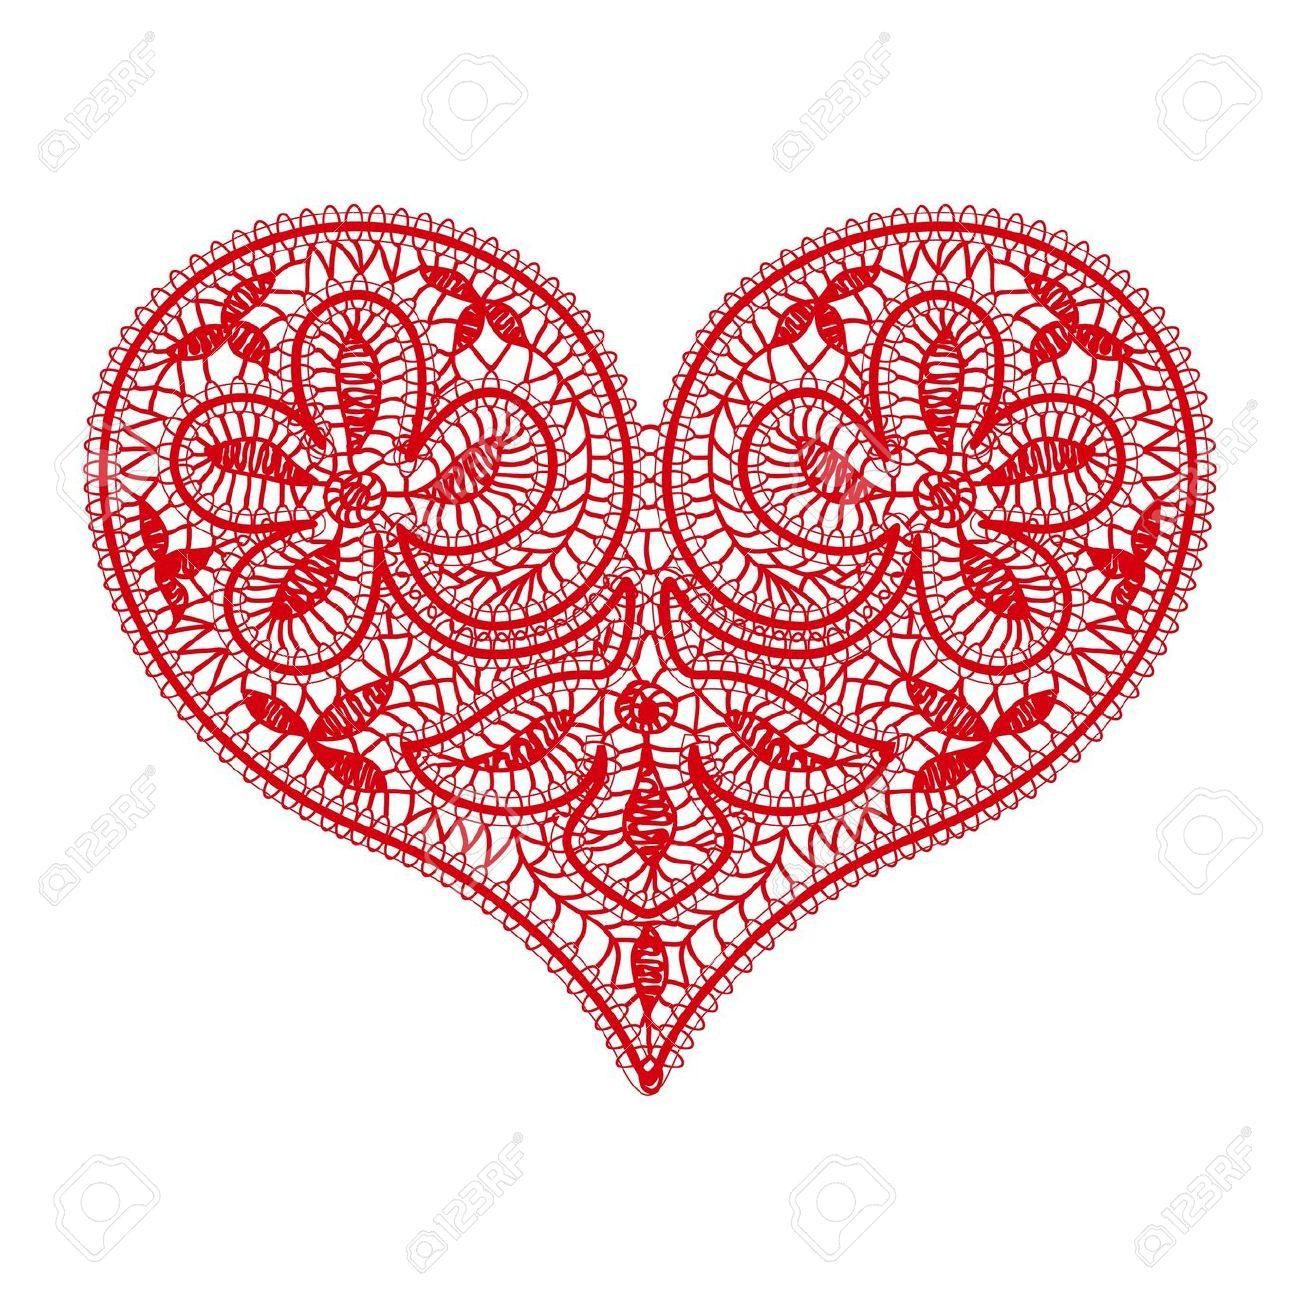 White lace heart transparent clipart no background.